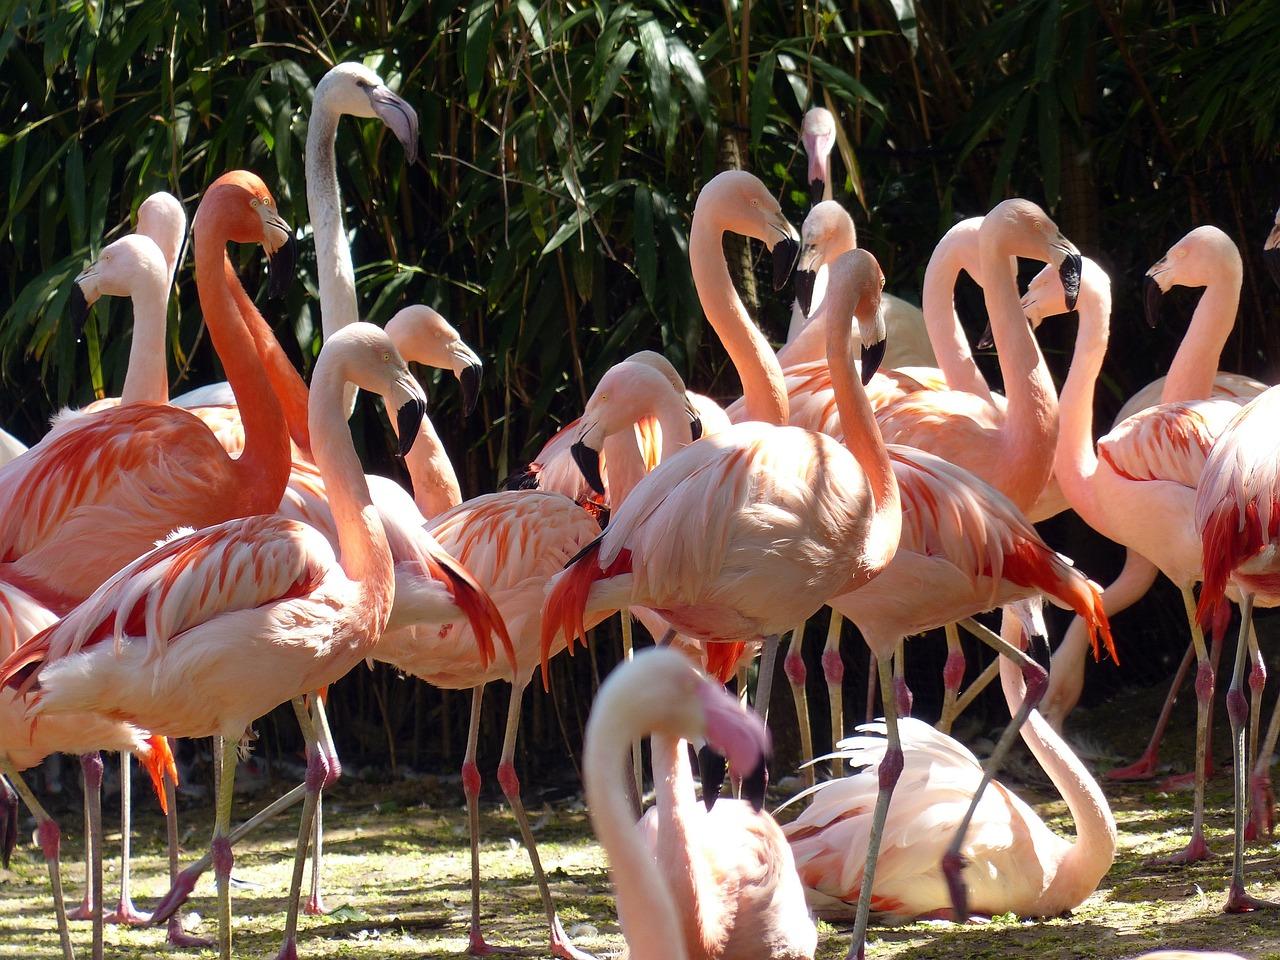 розовый фламинго фотографии развитии